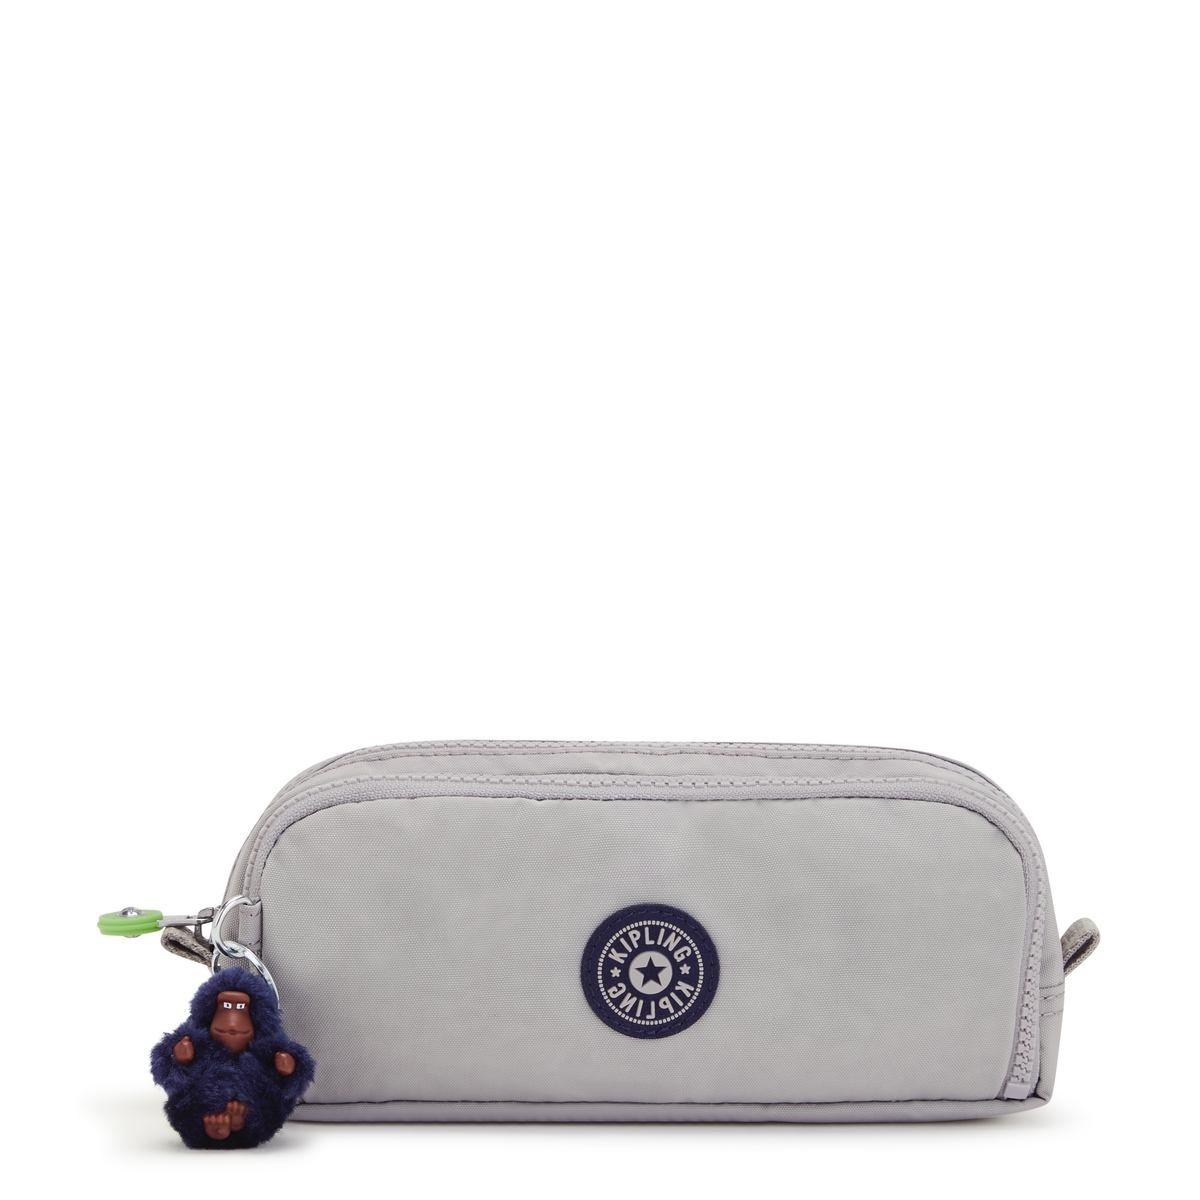 Kipling κασετίνα 10x23x7 cm Gitrou Playful Grey